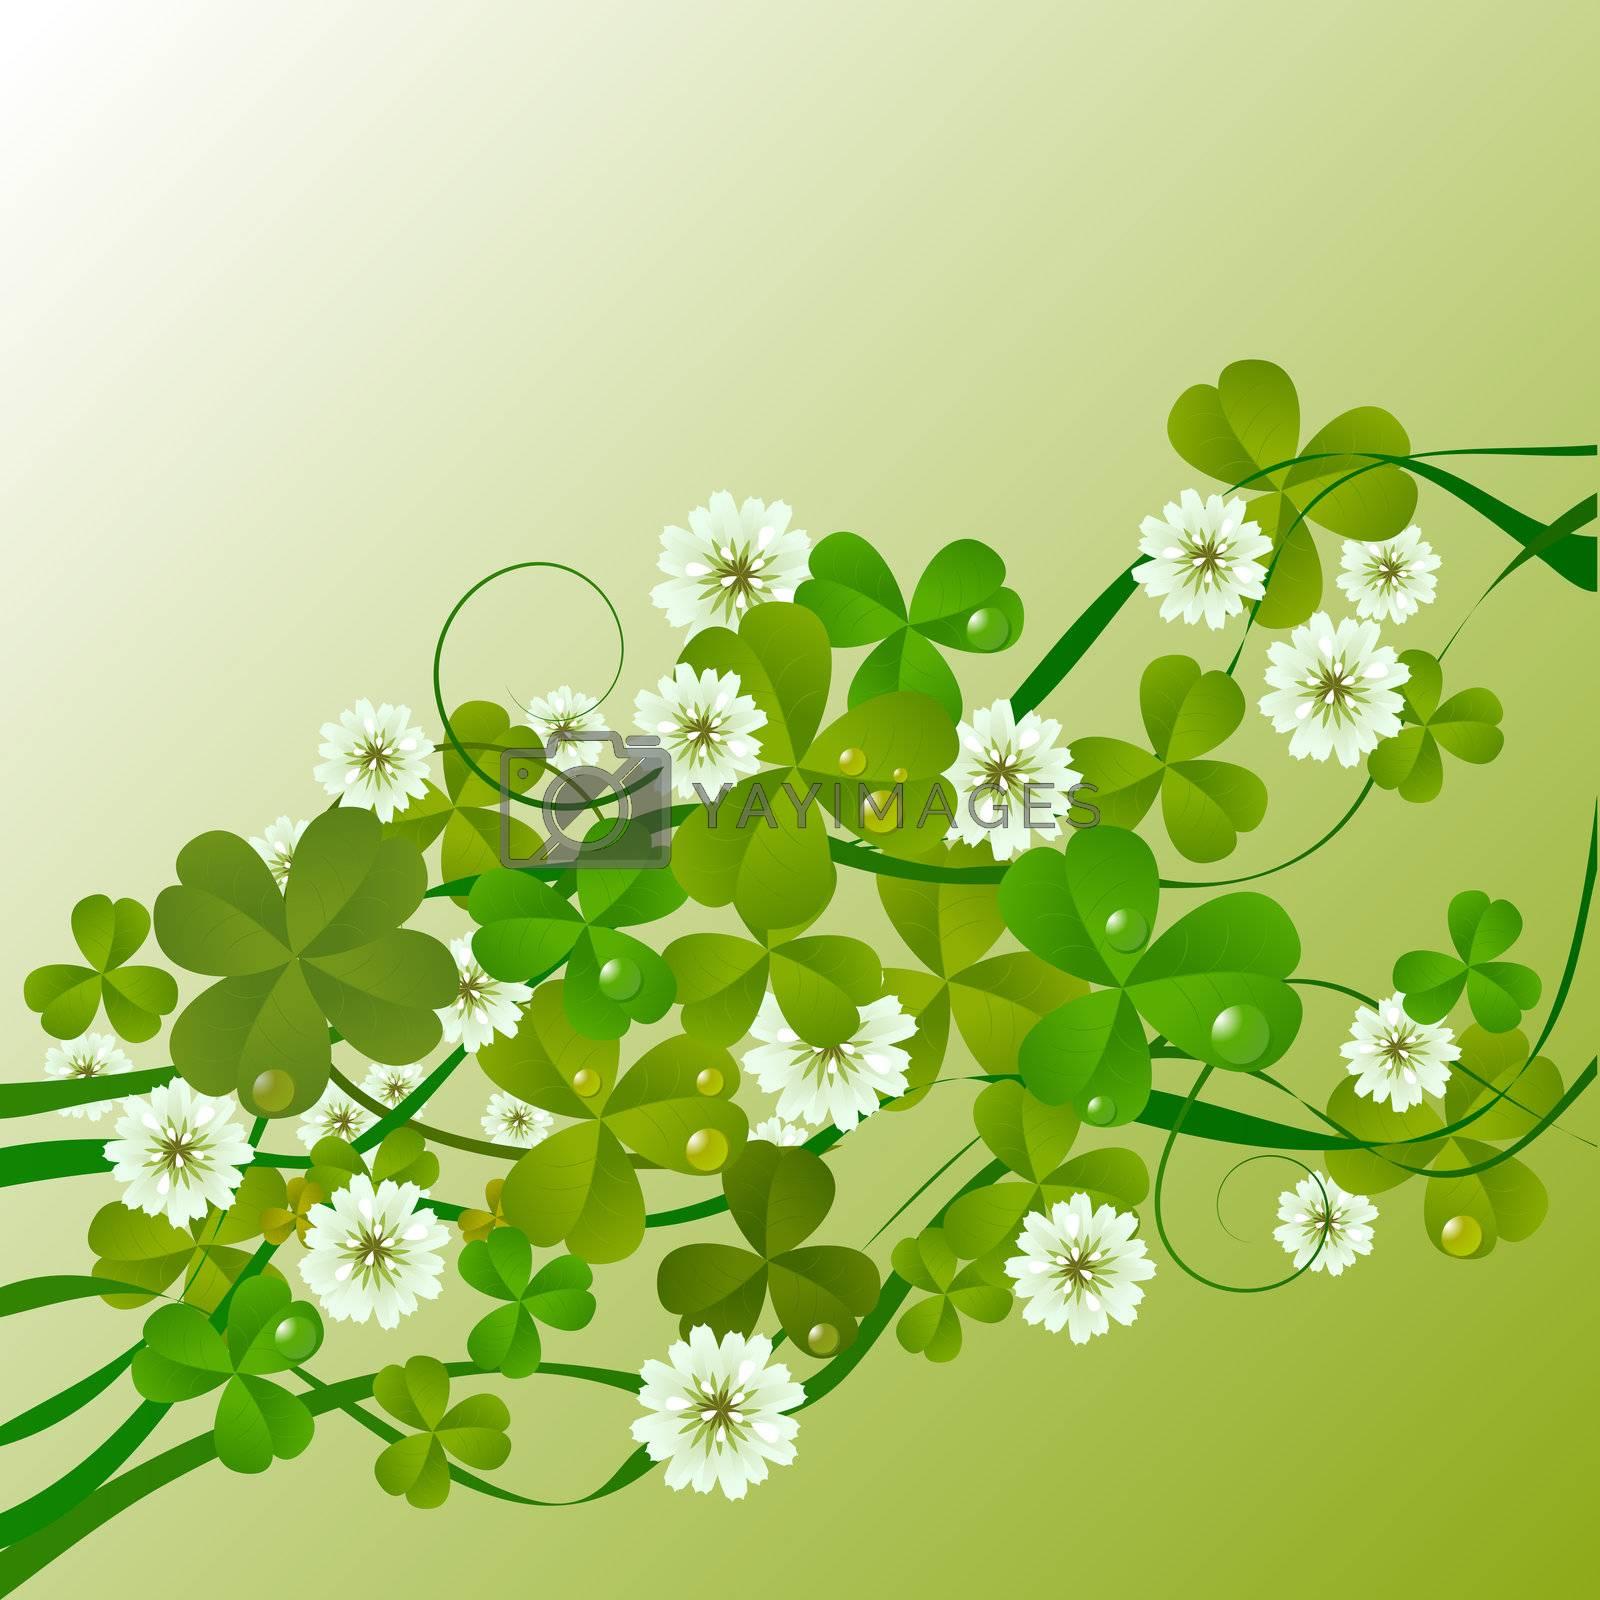 St. Patrick's Day design background